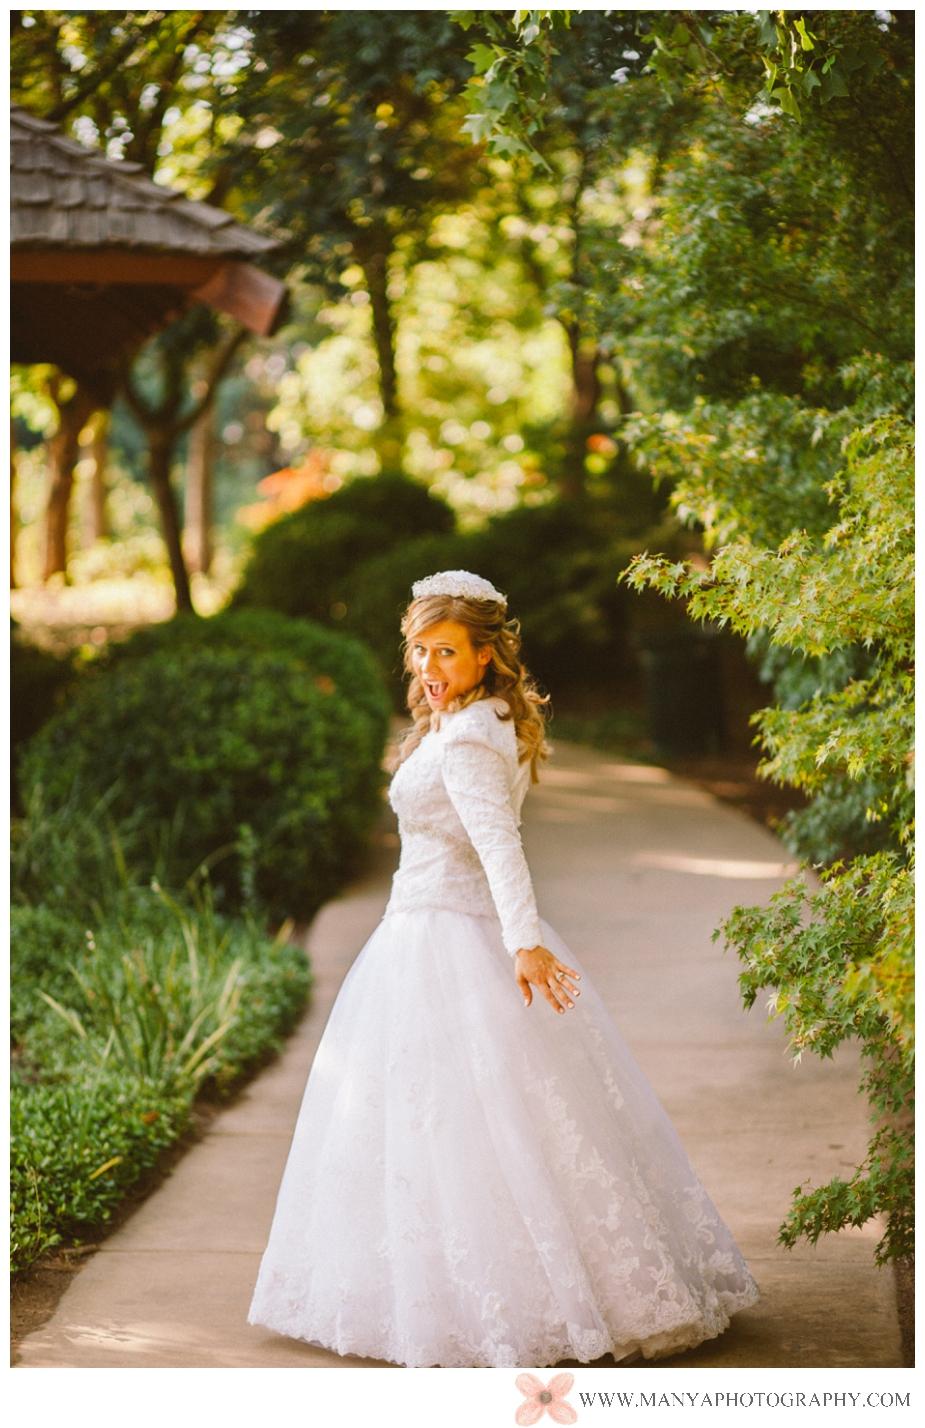 2013-08-29_0041 - Orange County Wedding Photographer